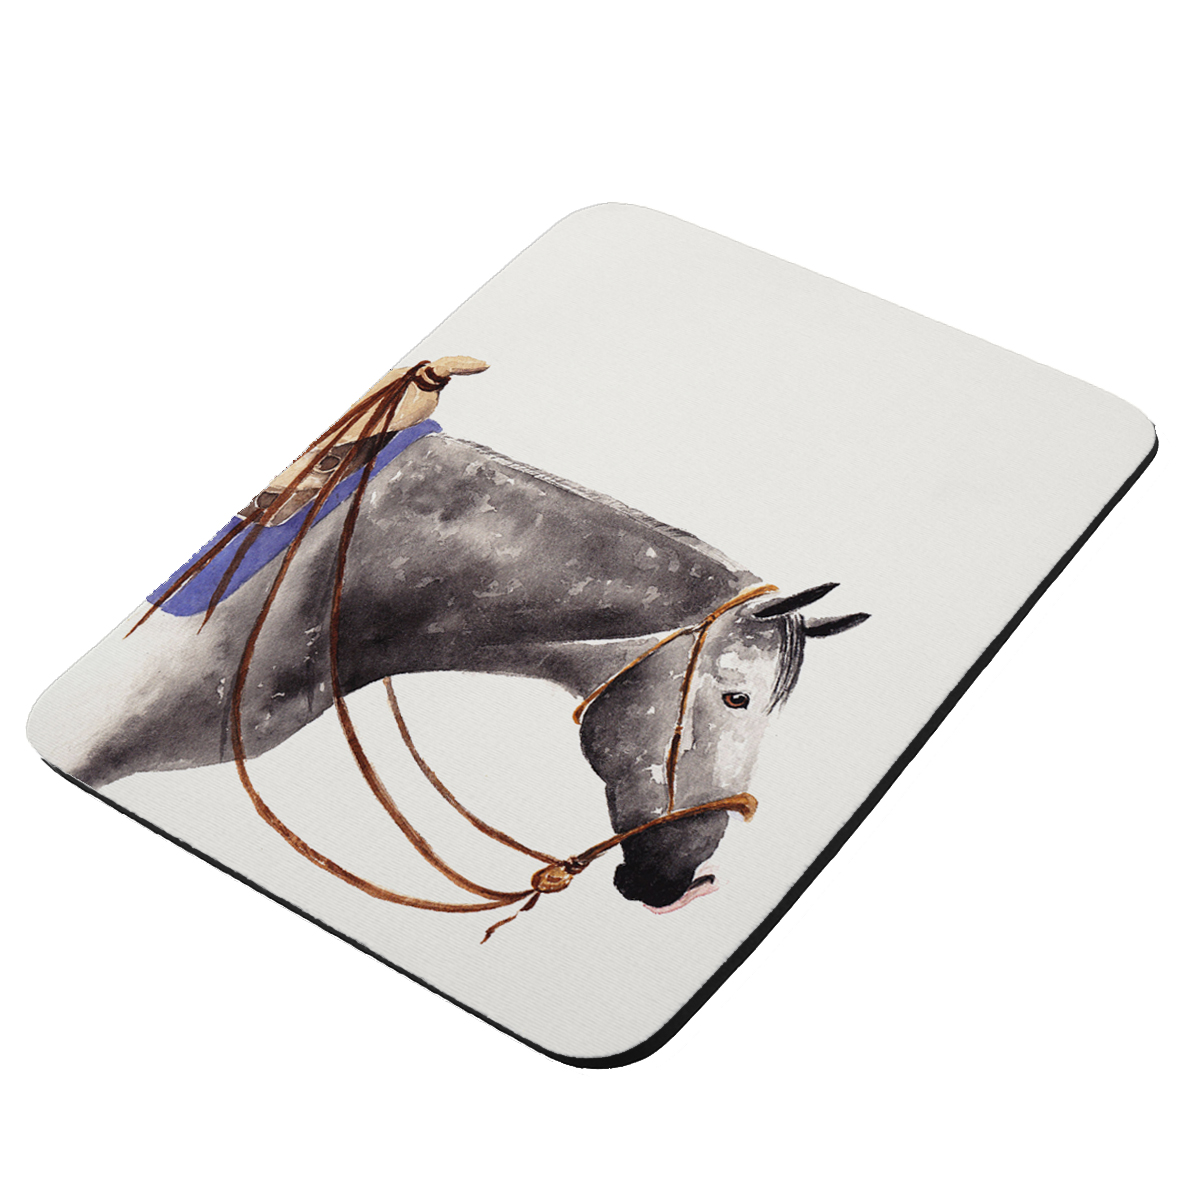 Dappled Gray Quarter Horse Art by Denise Every - KuzmarK Mousepad / Hot Pad / Trivet